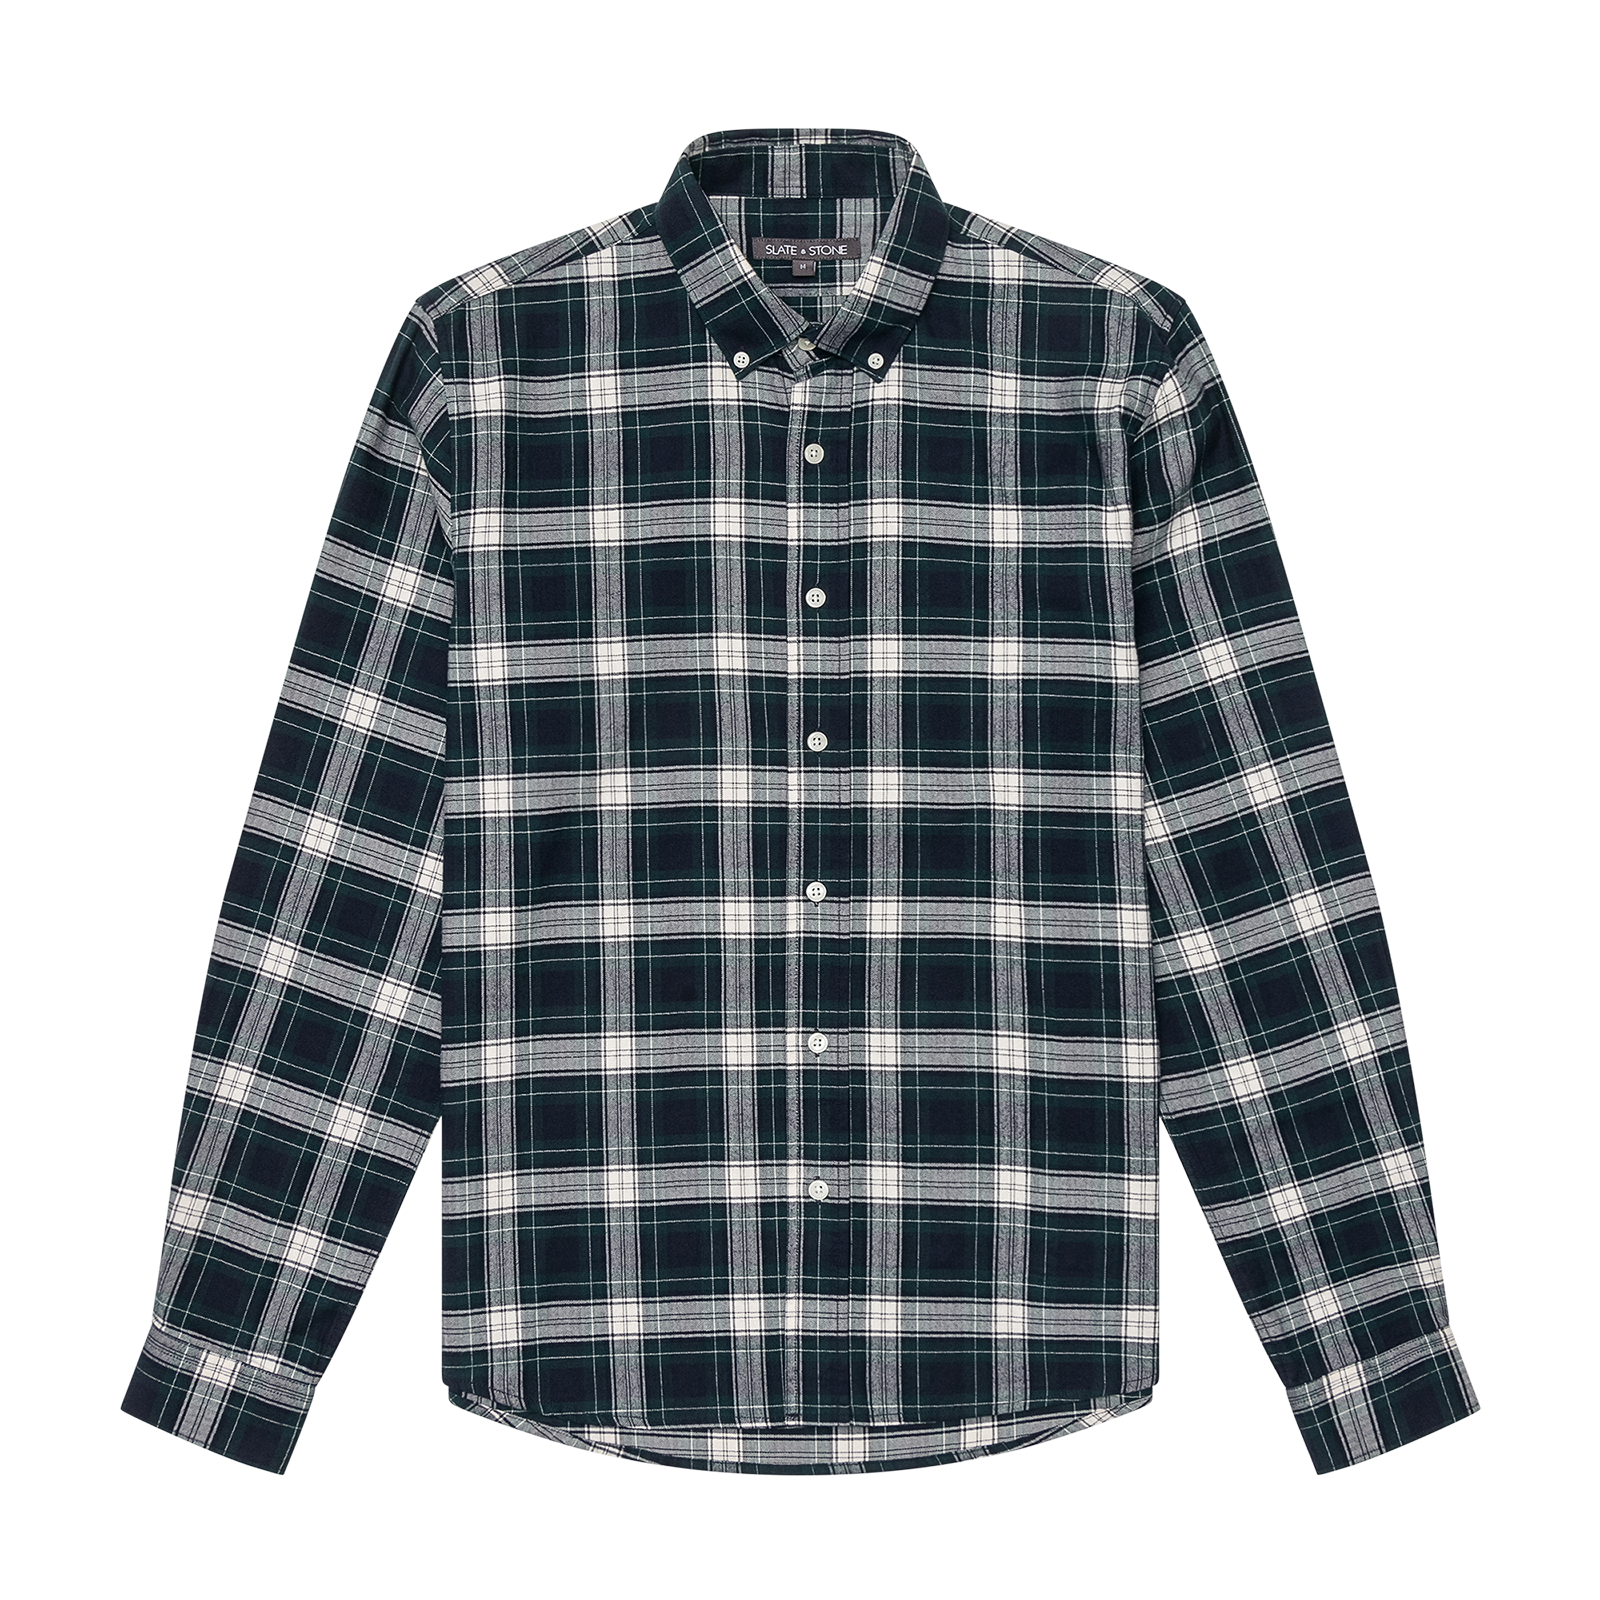 Flat lay shirt product photo